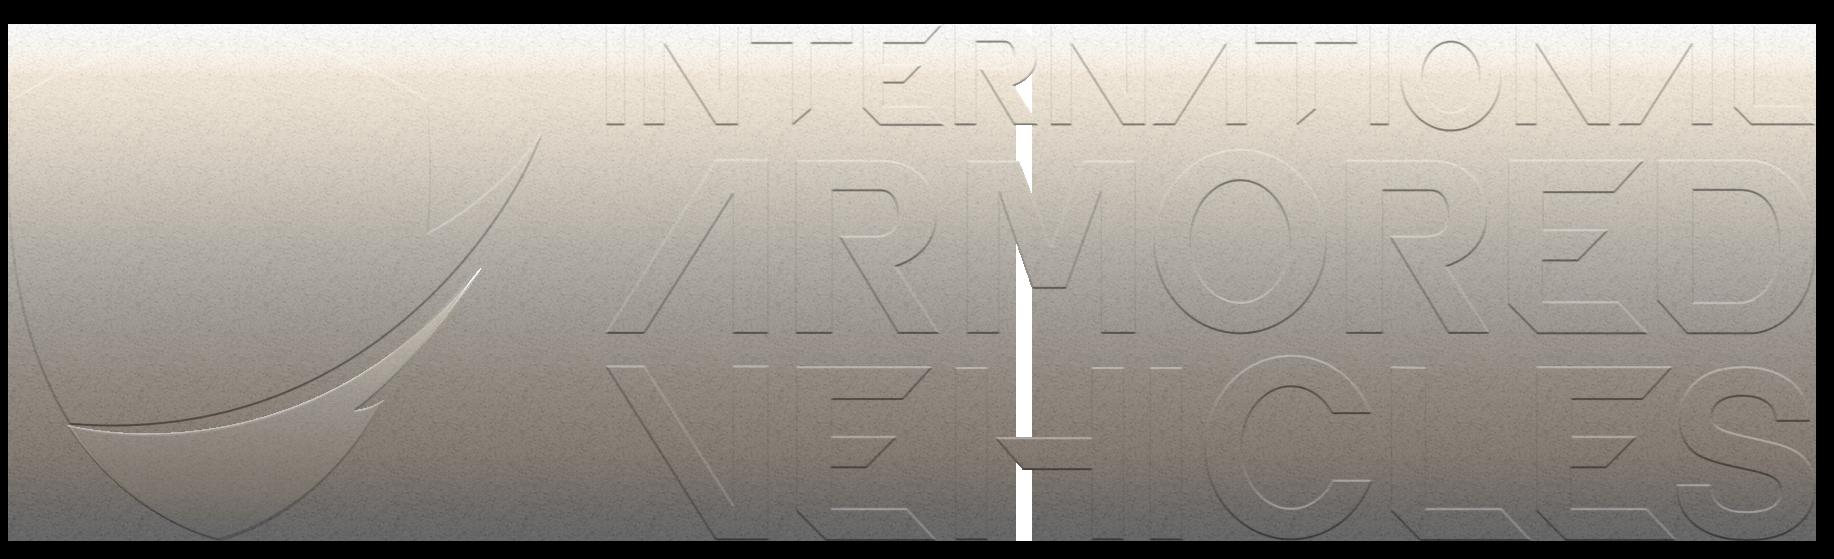 International Armored Vehicles